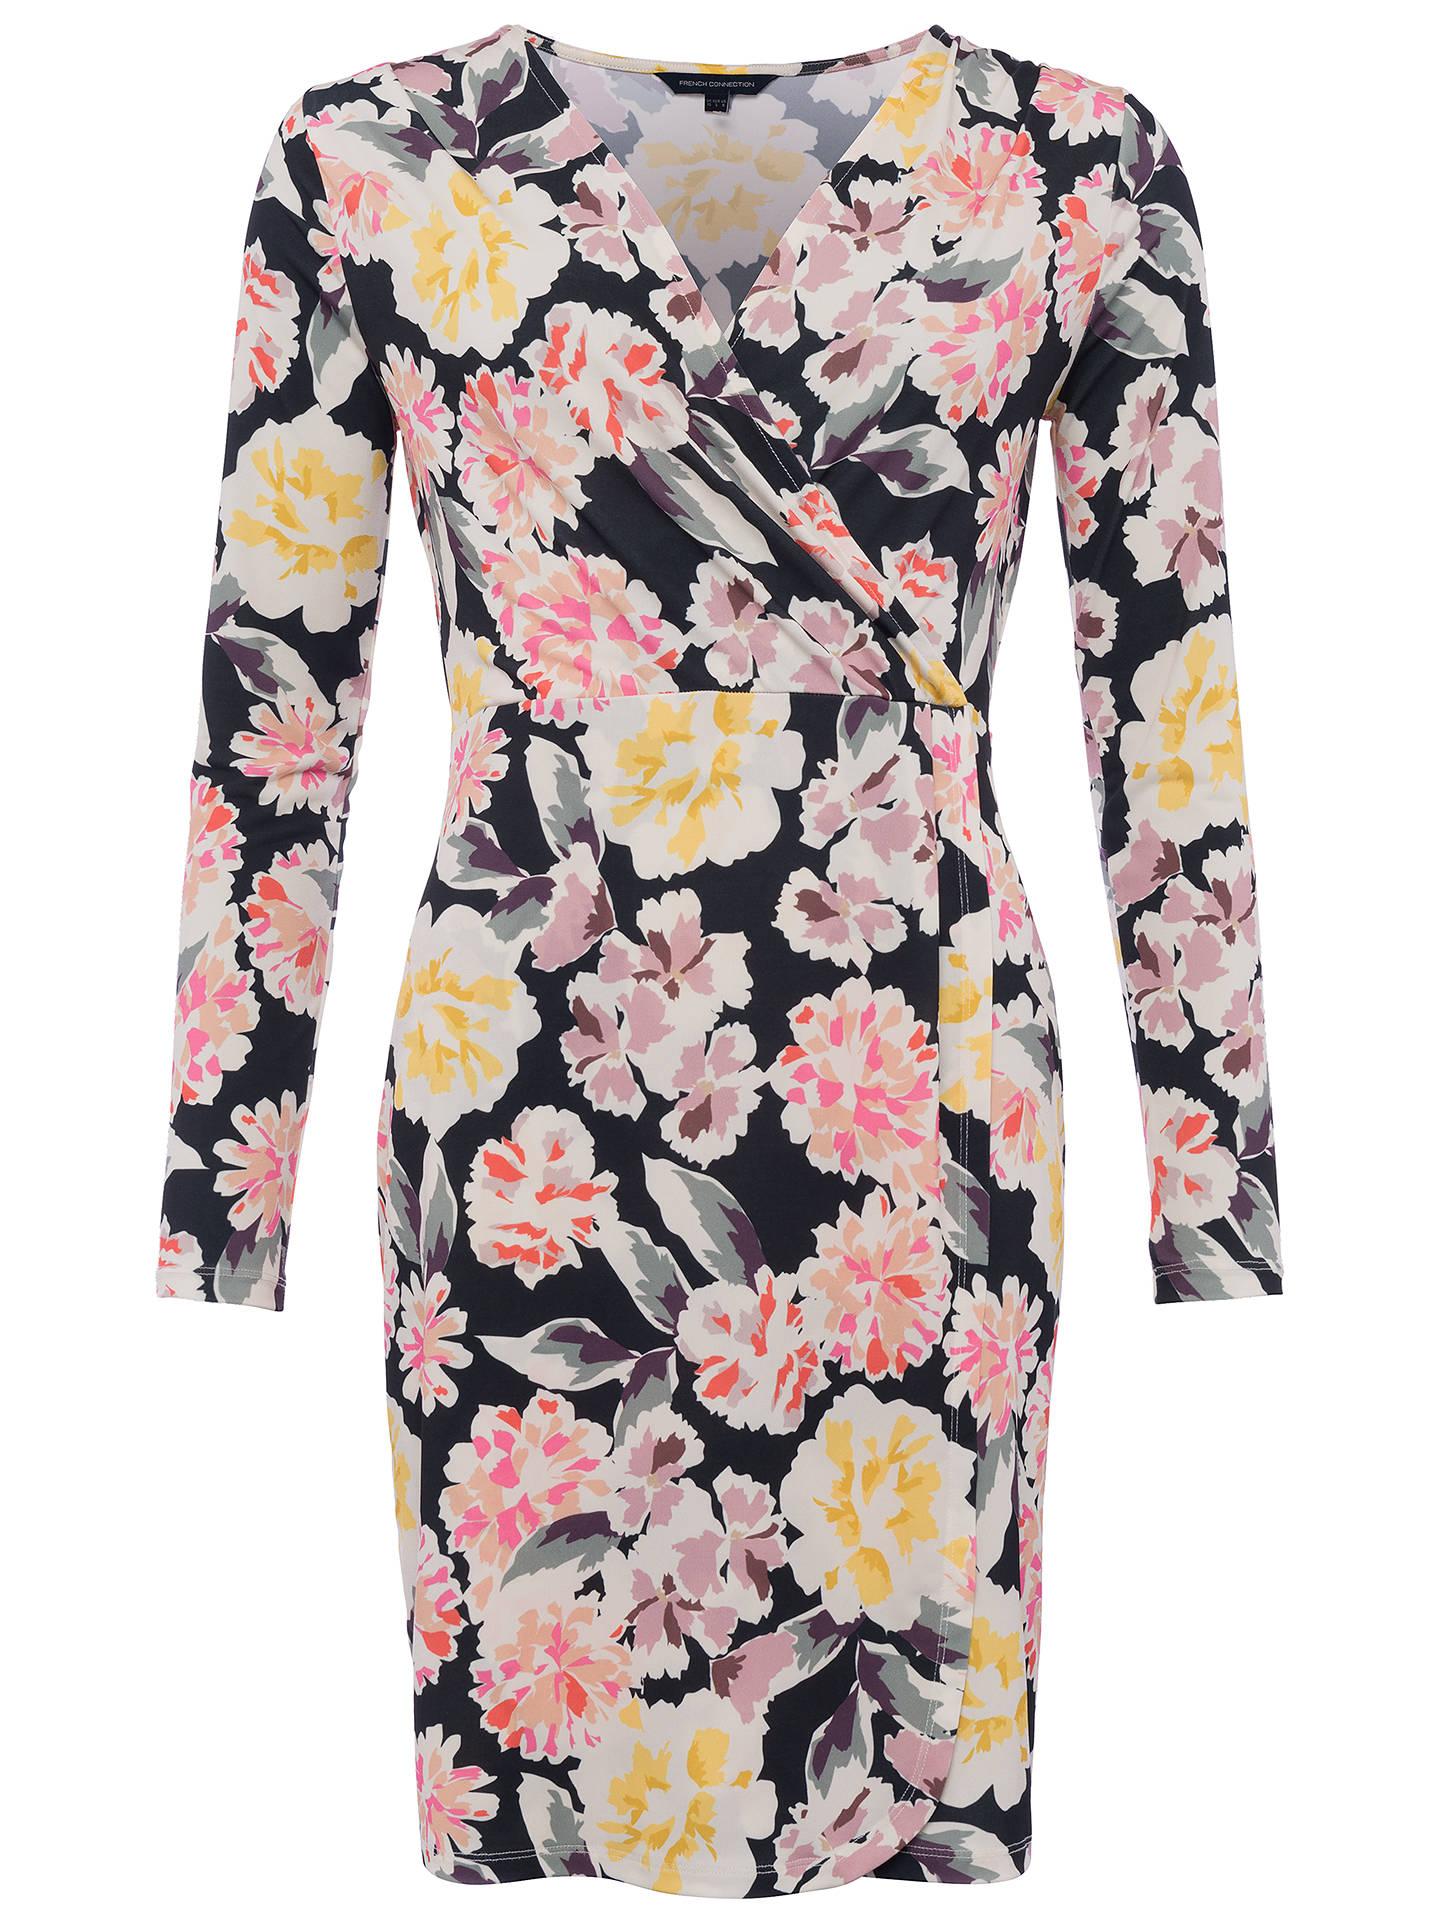 67c18751cd3 Buy French Connection Enoshima Printed Dress, Black/Multi, 6 Online at  johnlewis.